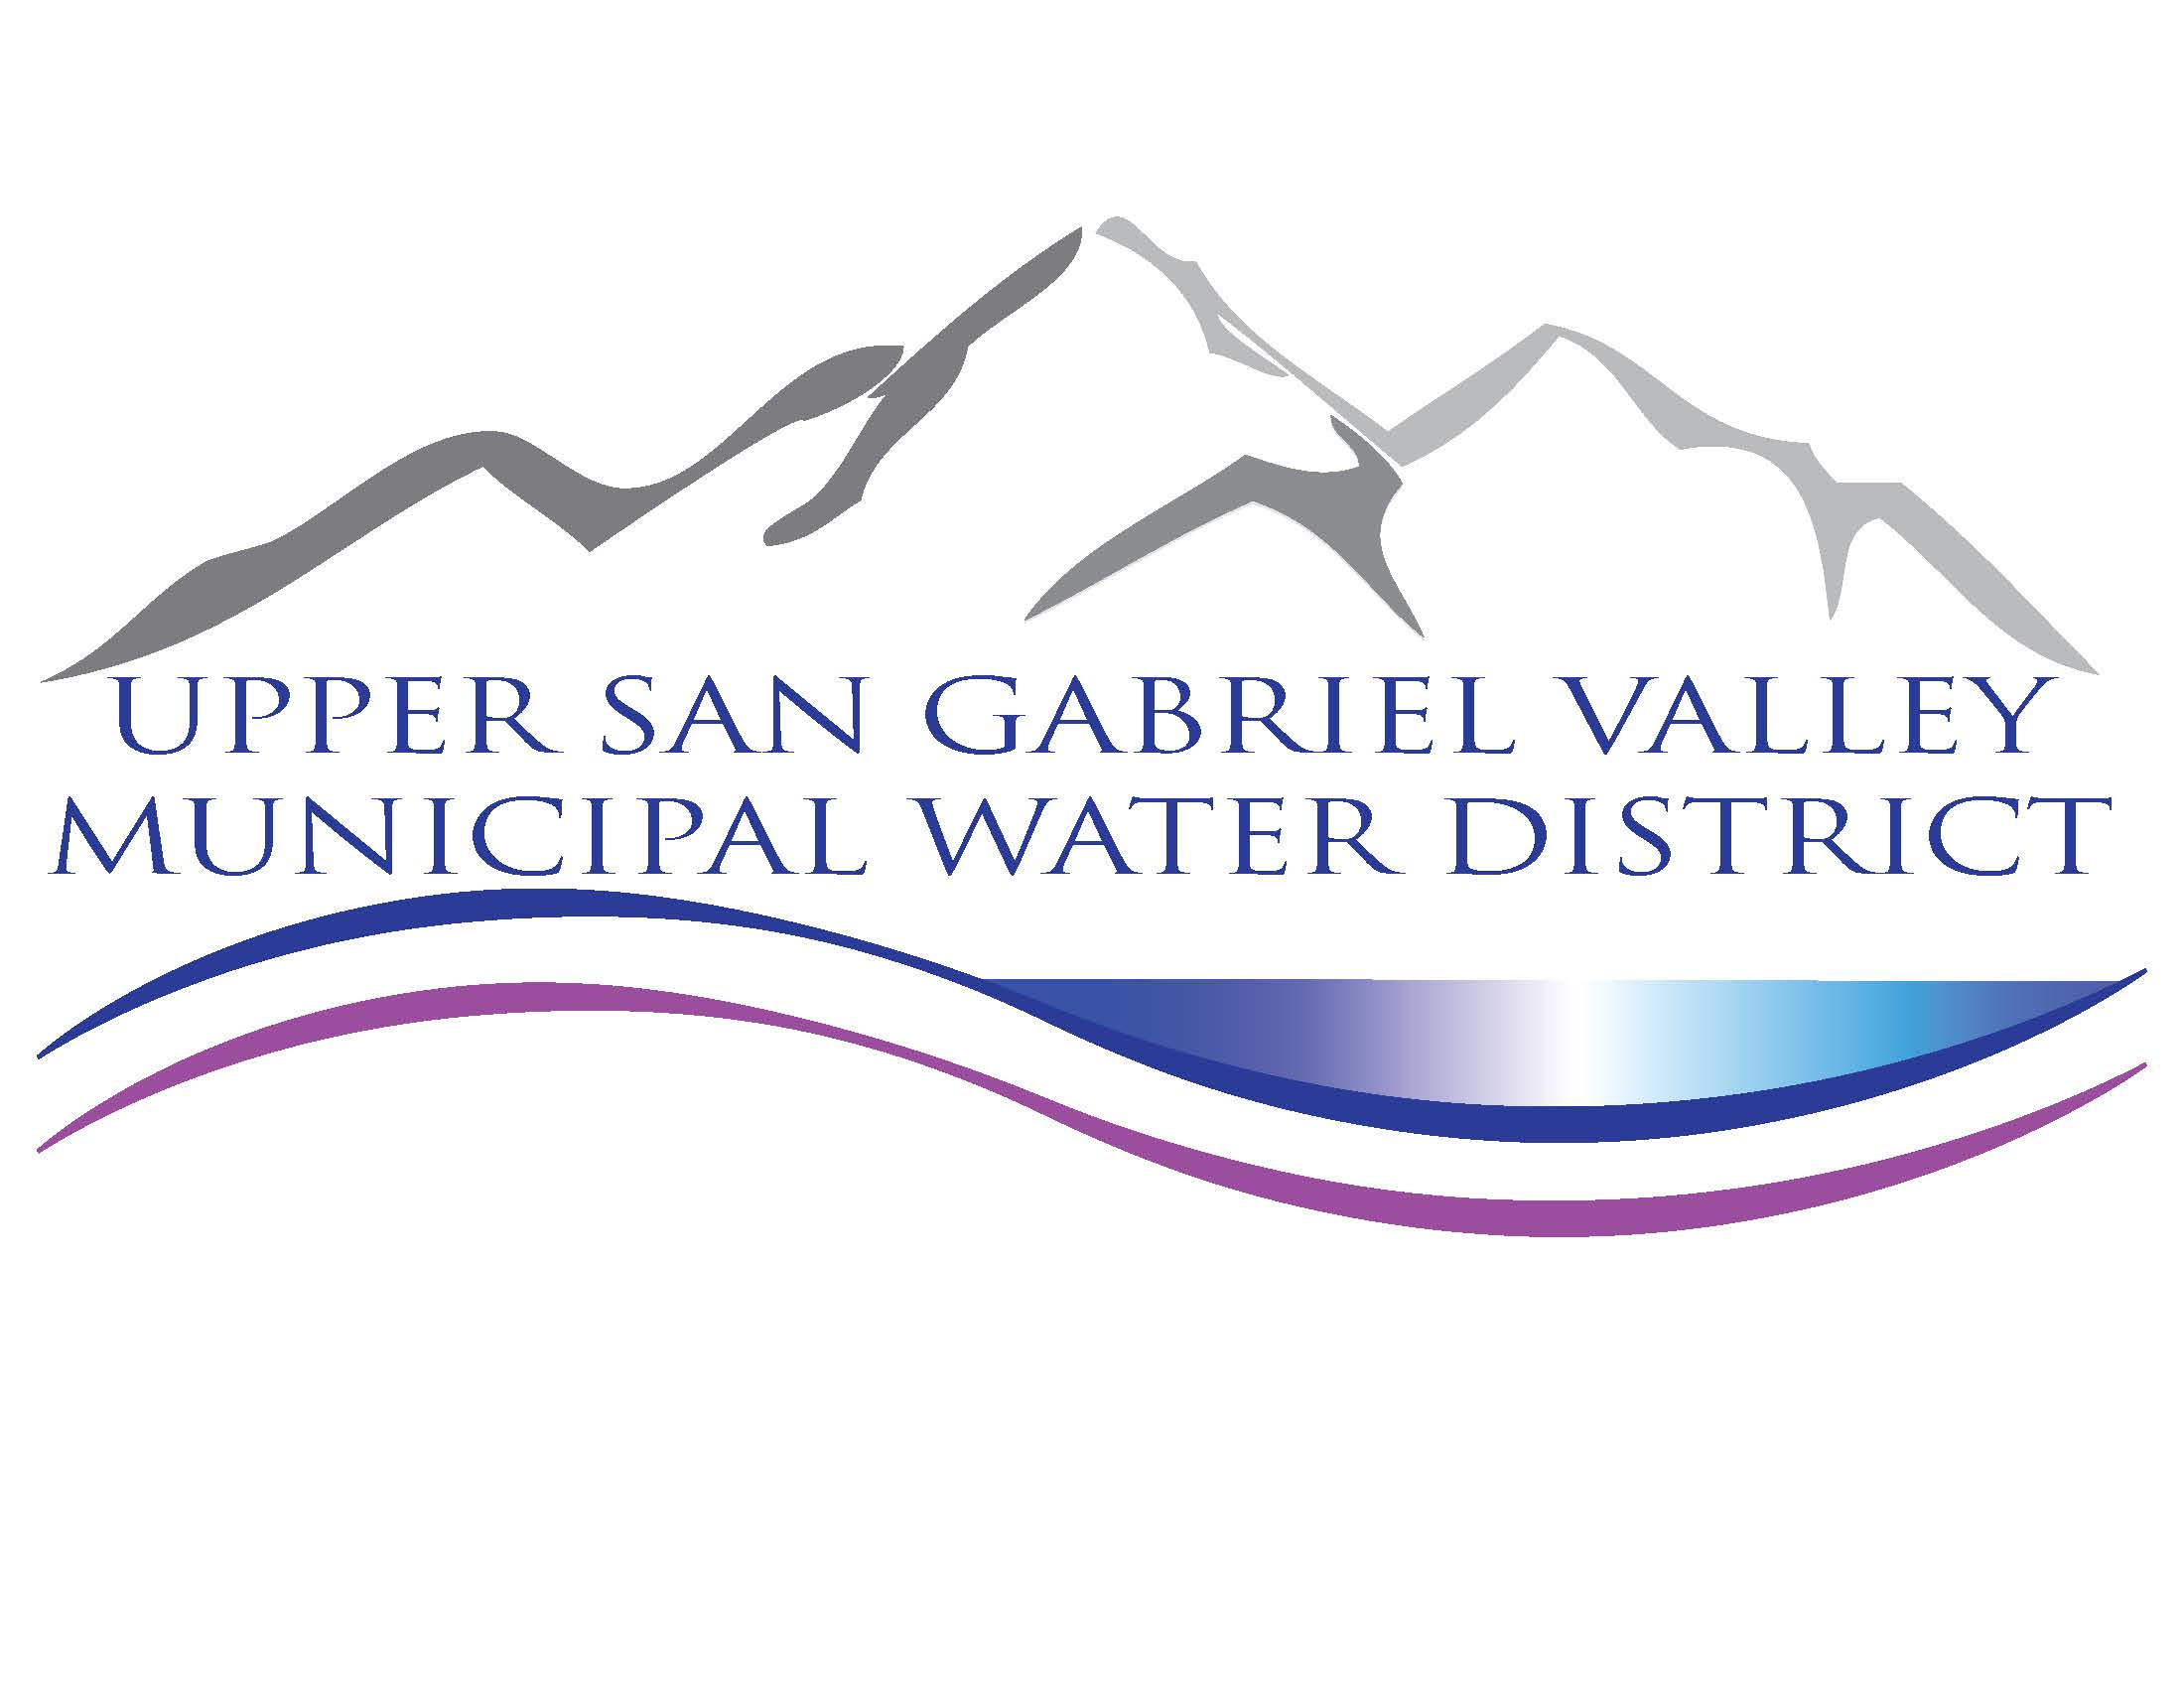 Upper San Gabriel Valley Municipal Water District